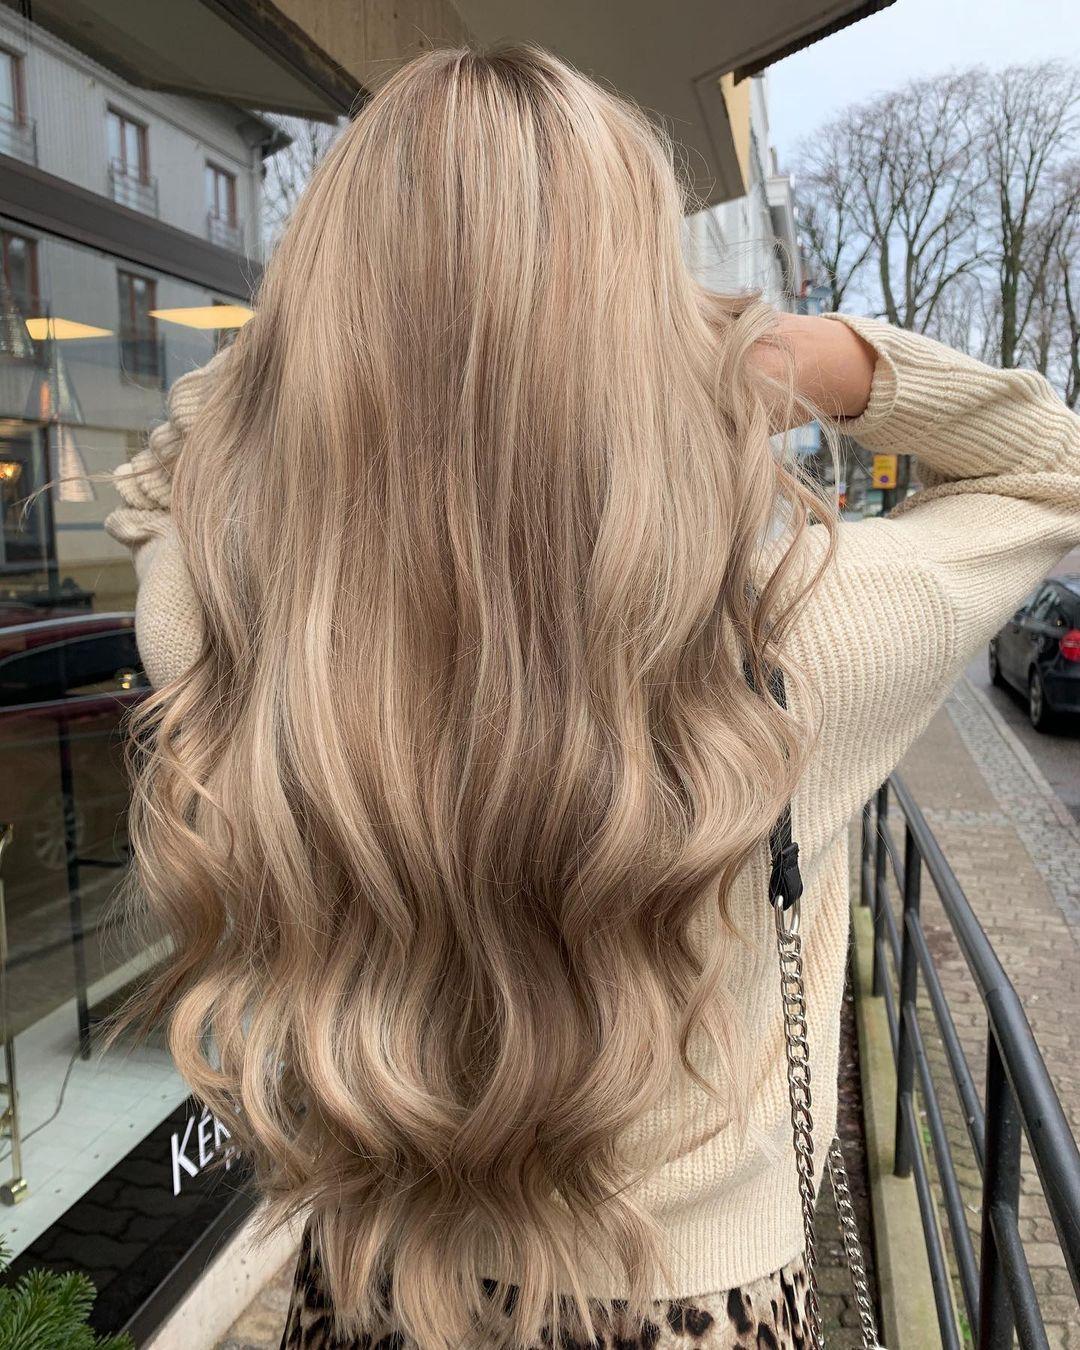 "Hair by Angels on Instagram: ""Från att vara helblekt till detta🤍 #hairbyangelsmadde #lowlights #blondehair #brownhair #balayage #lorealpro #lorealprofessionnel…"""